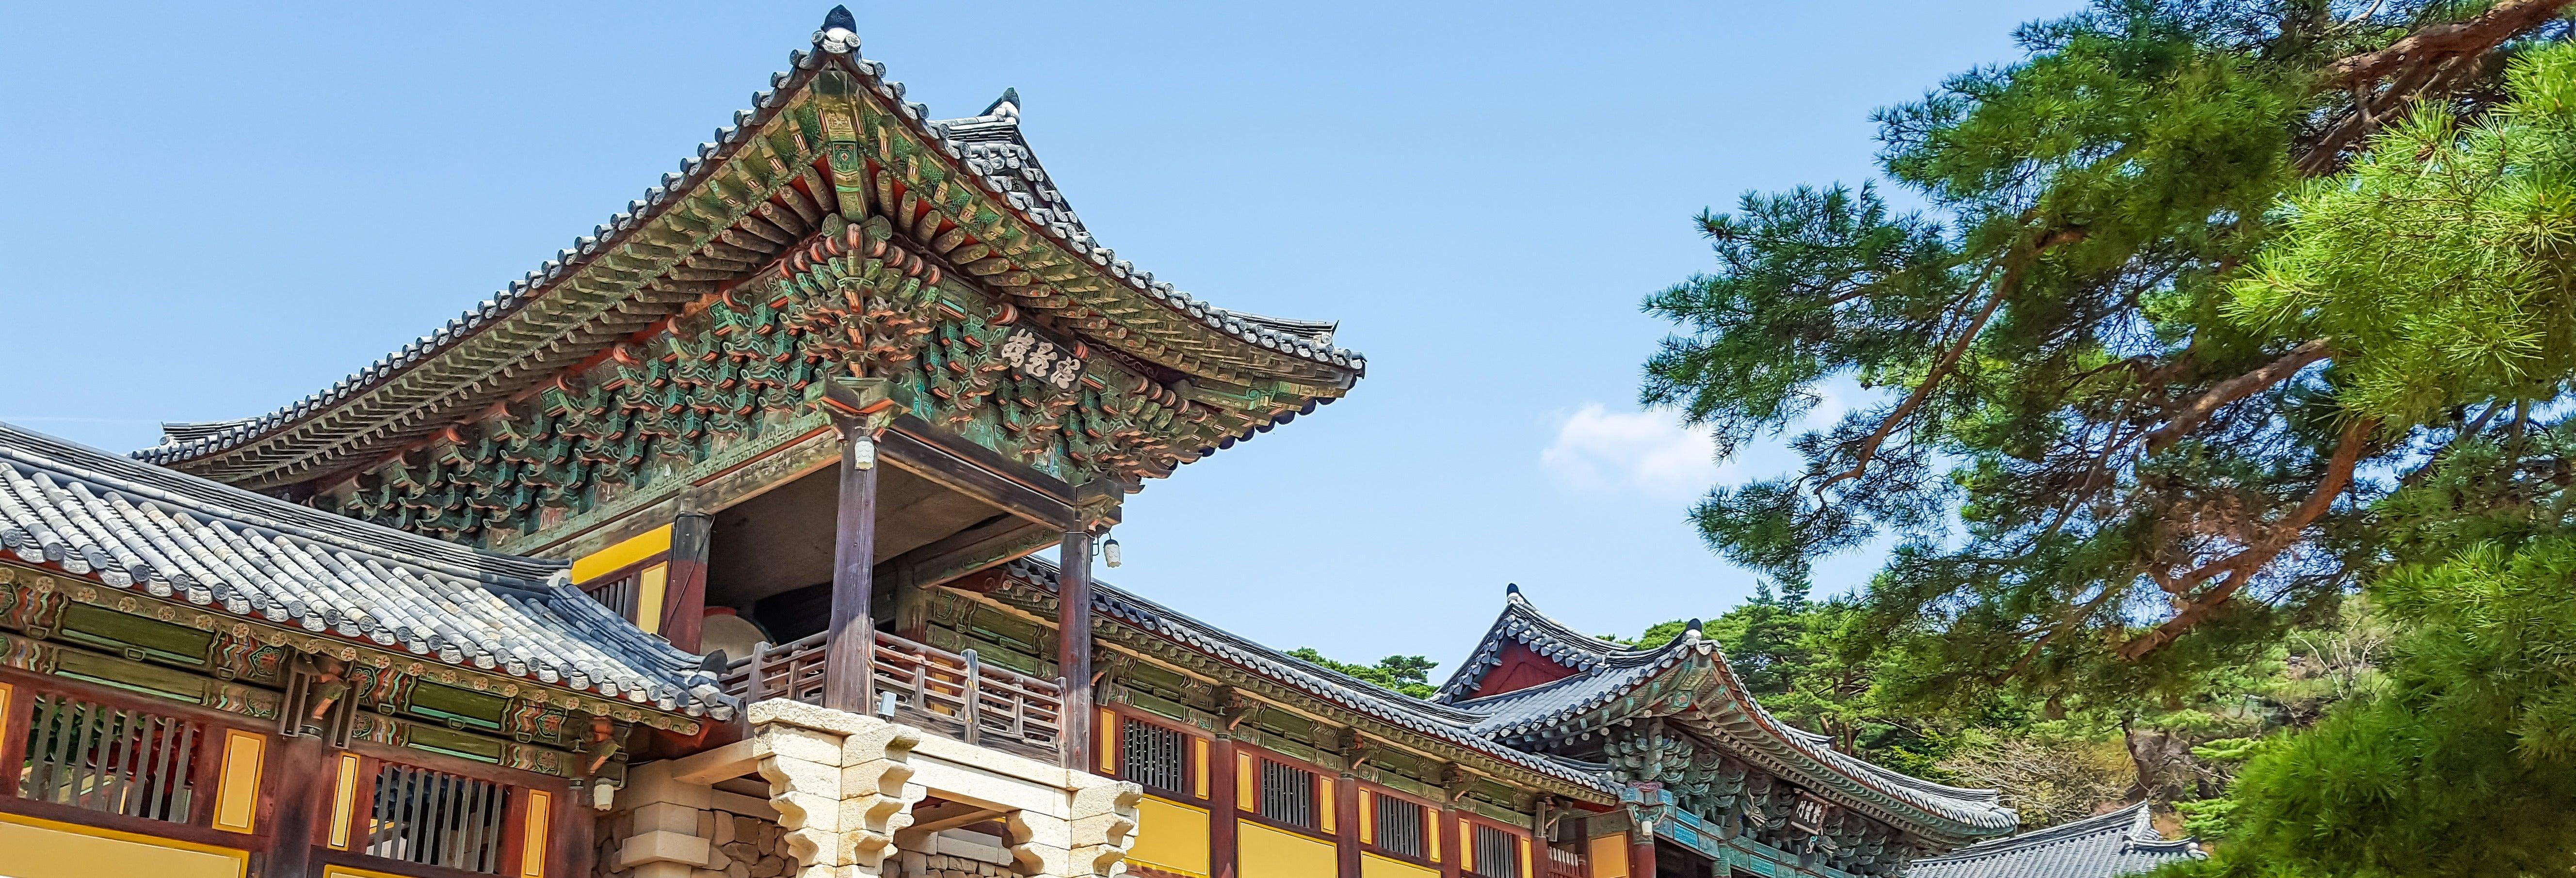 Excursión a Gyeongju